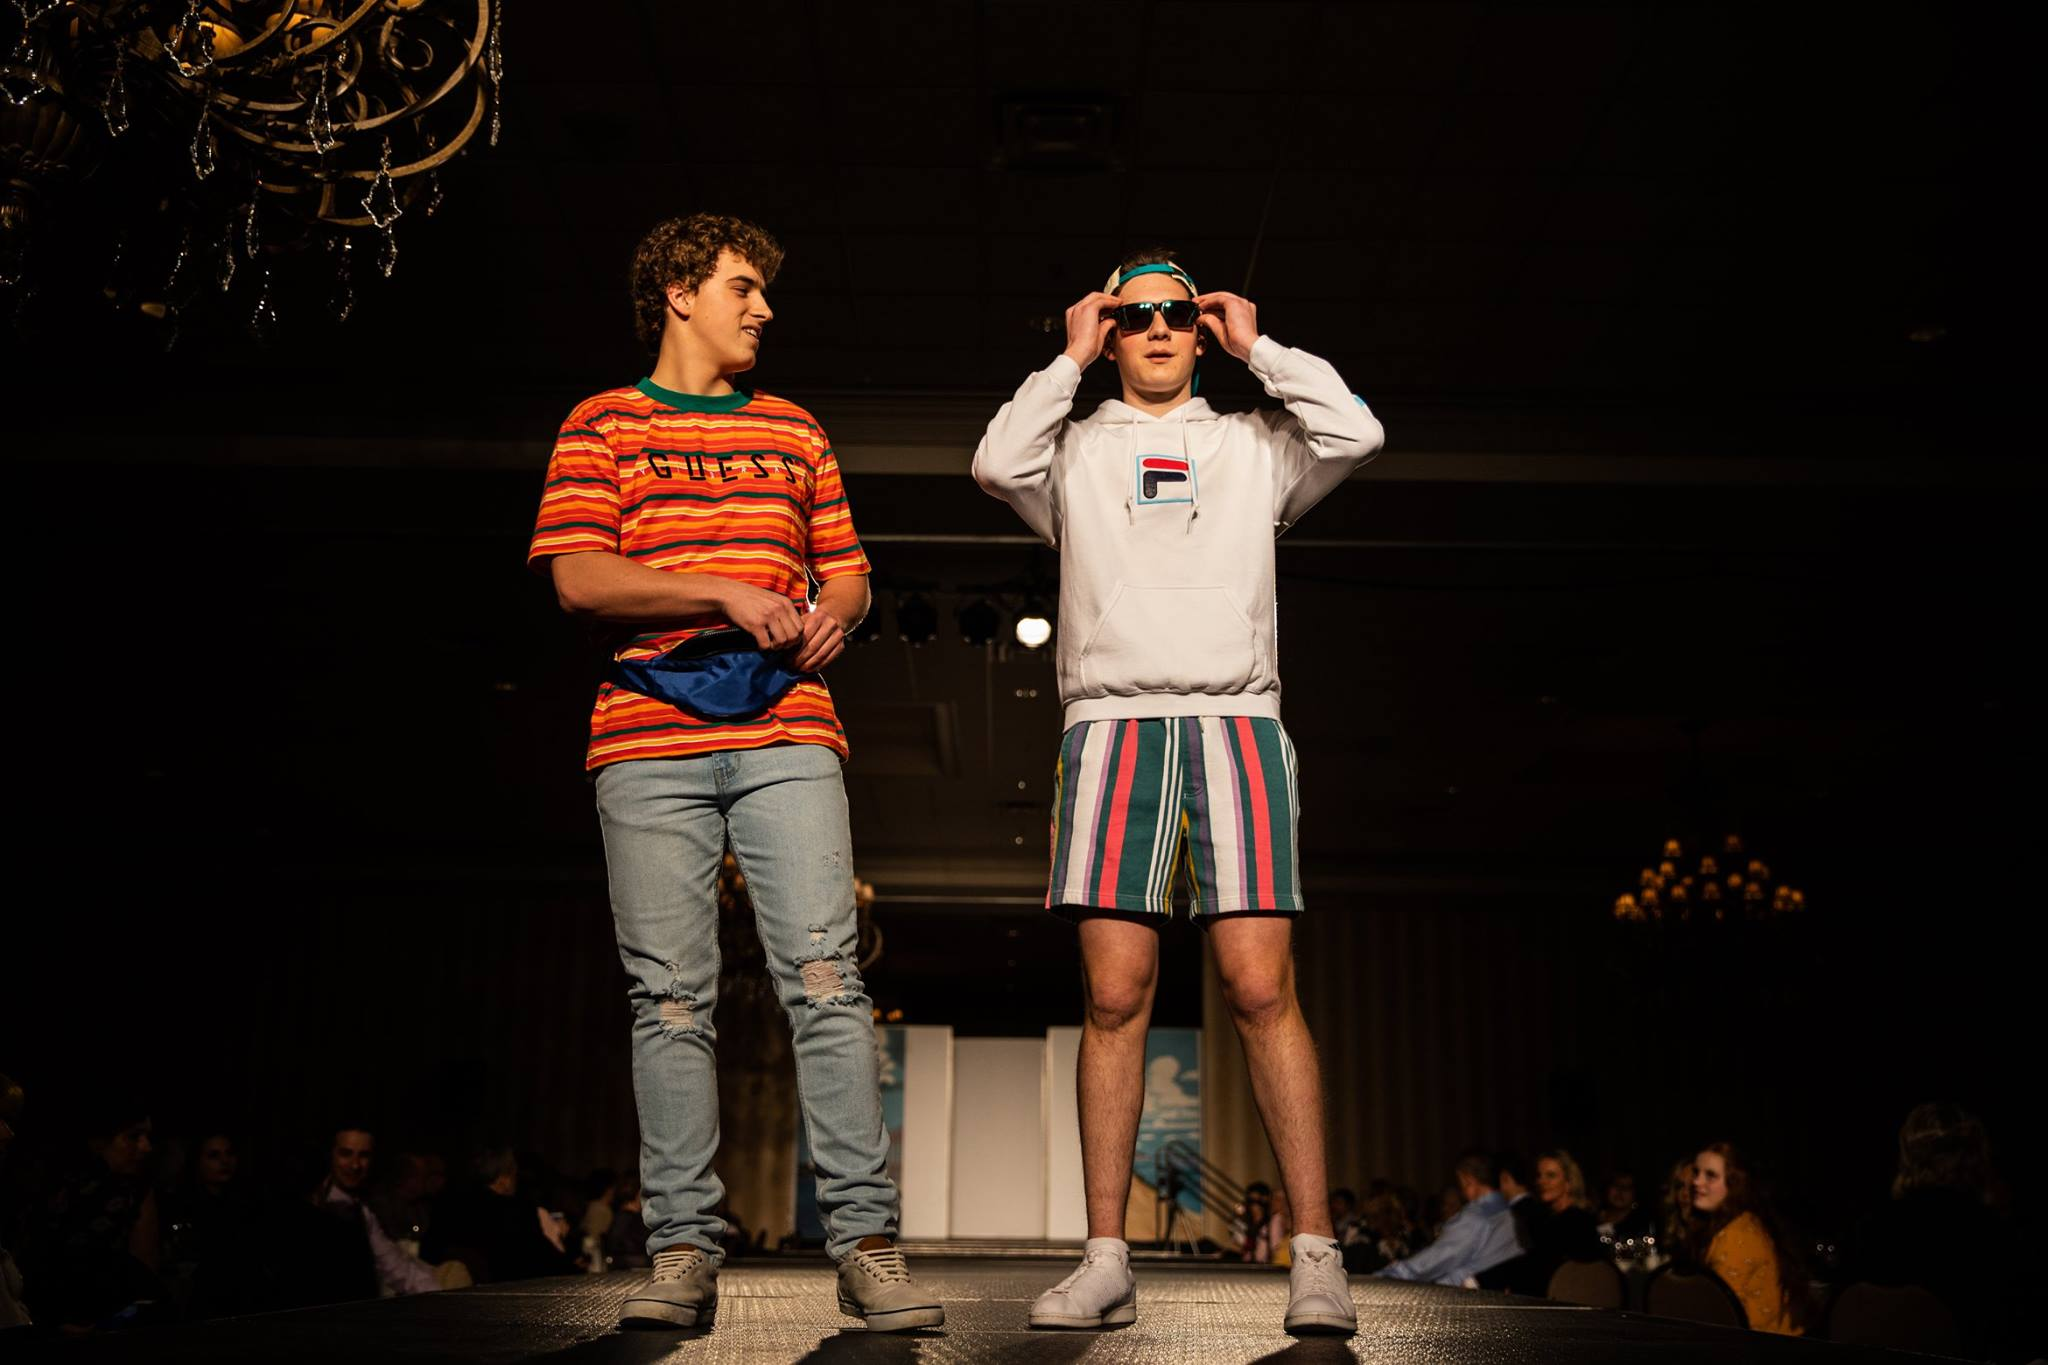 Lutheran_North_High_School_Macomb_Michigan_LHN_Fashion_Show_2019 (29).jpg